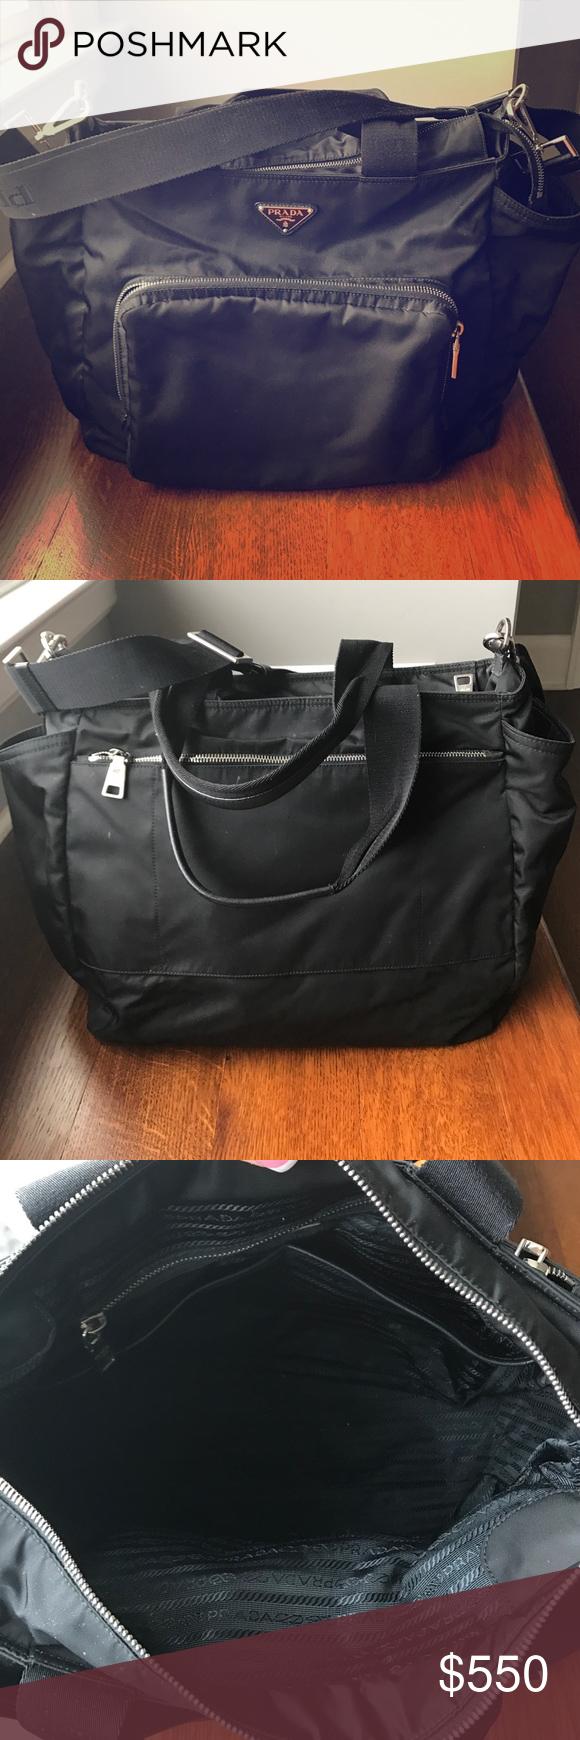 4dfda14b2300 AUTHENTIC Prada Veda Diaper bag!! Prada durable nylon baby bag with  silvertone hardware. Rolled top handles